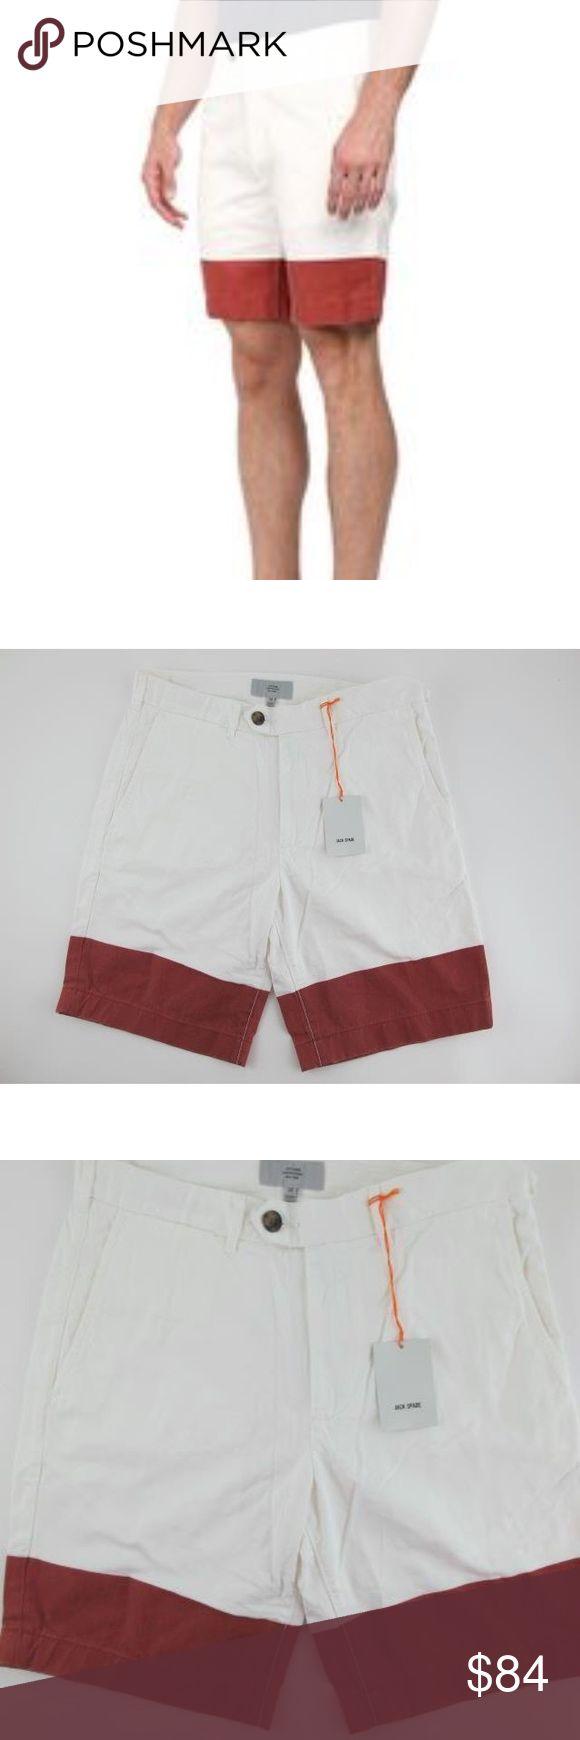 ♠️️ JACK SPADE ♠️️ Cole Shorts Trousers, White Red Nice men's shorts, dipped leg Jack Spade Shorts